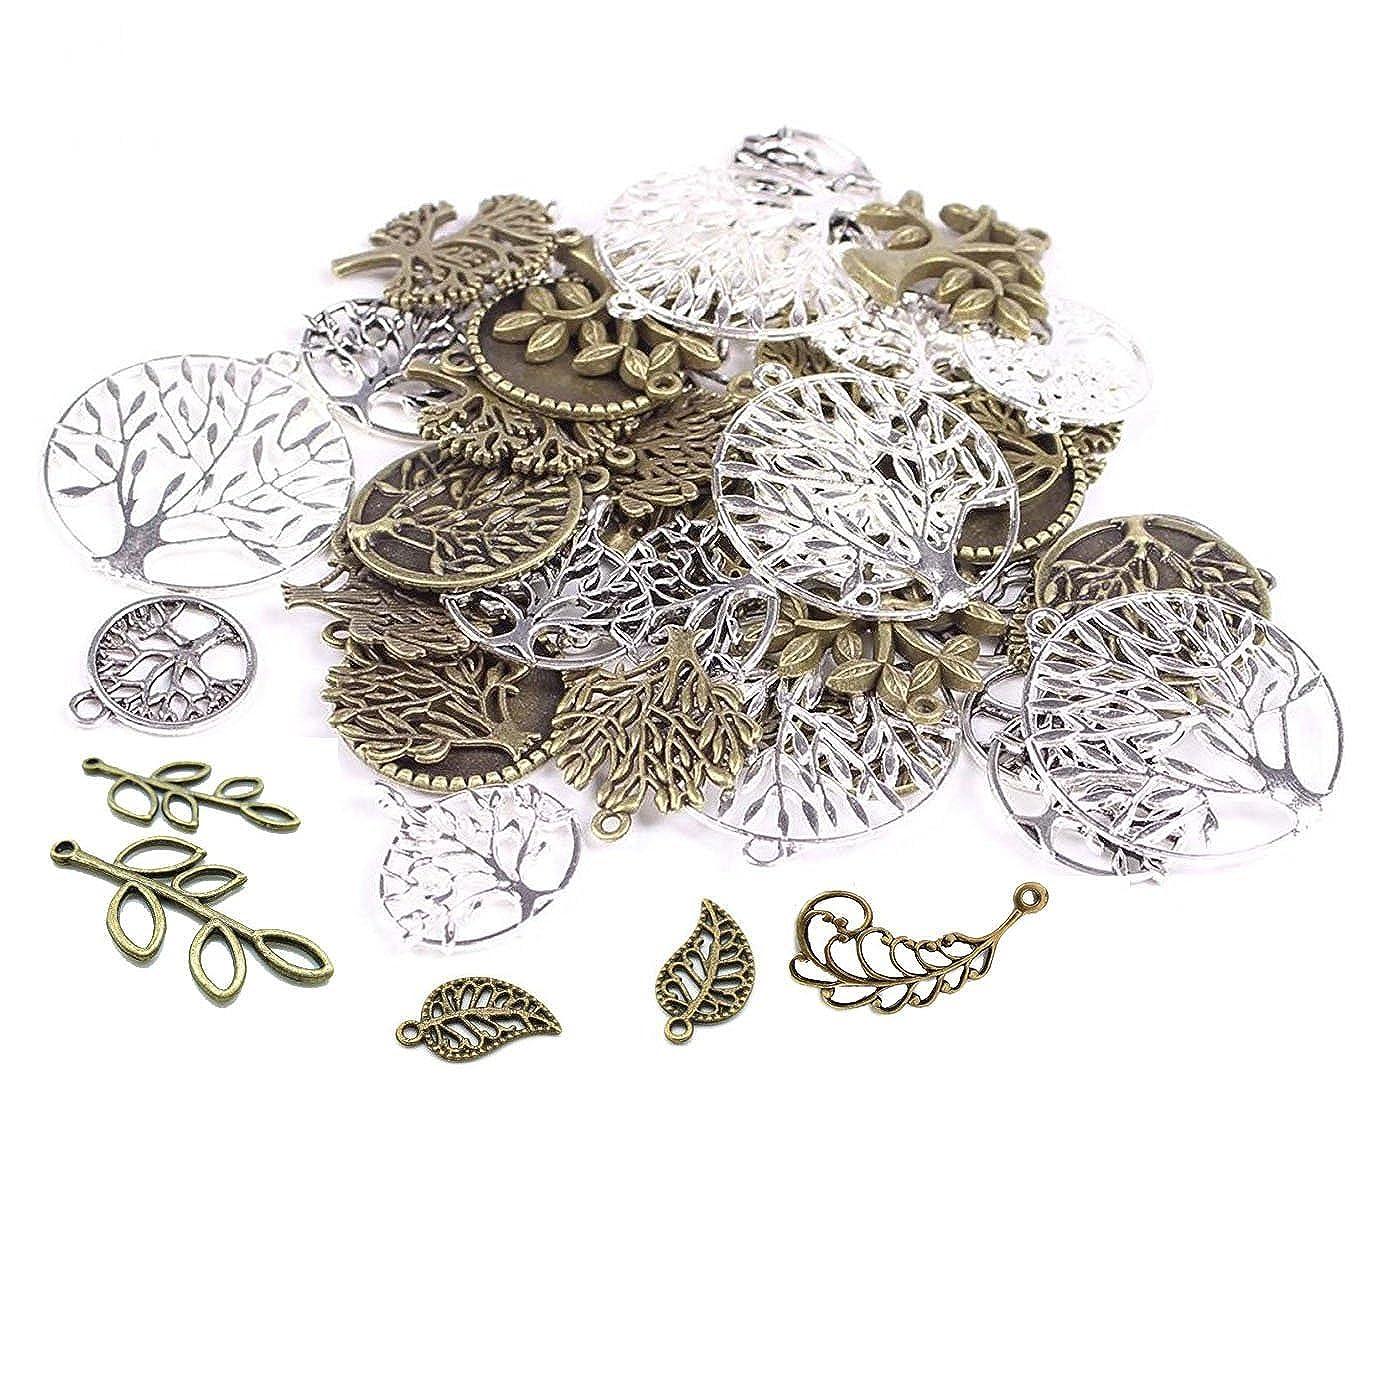 60PCS Tree& Flower& Leaf Antique Charms Beads Alloy Pendant Craft Accessory DIY Necklace Bracelet Craft Jewelry Making Supply HK12 … DAYONE JEWELRY LTD 1017SOWZVYQ